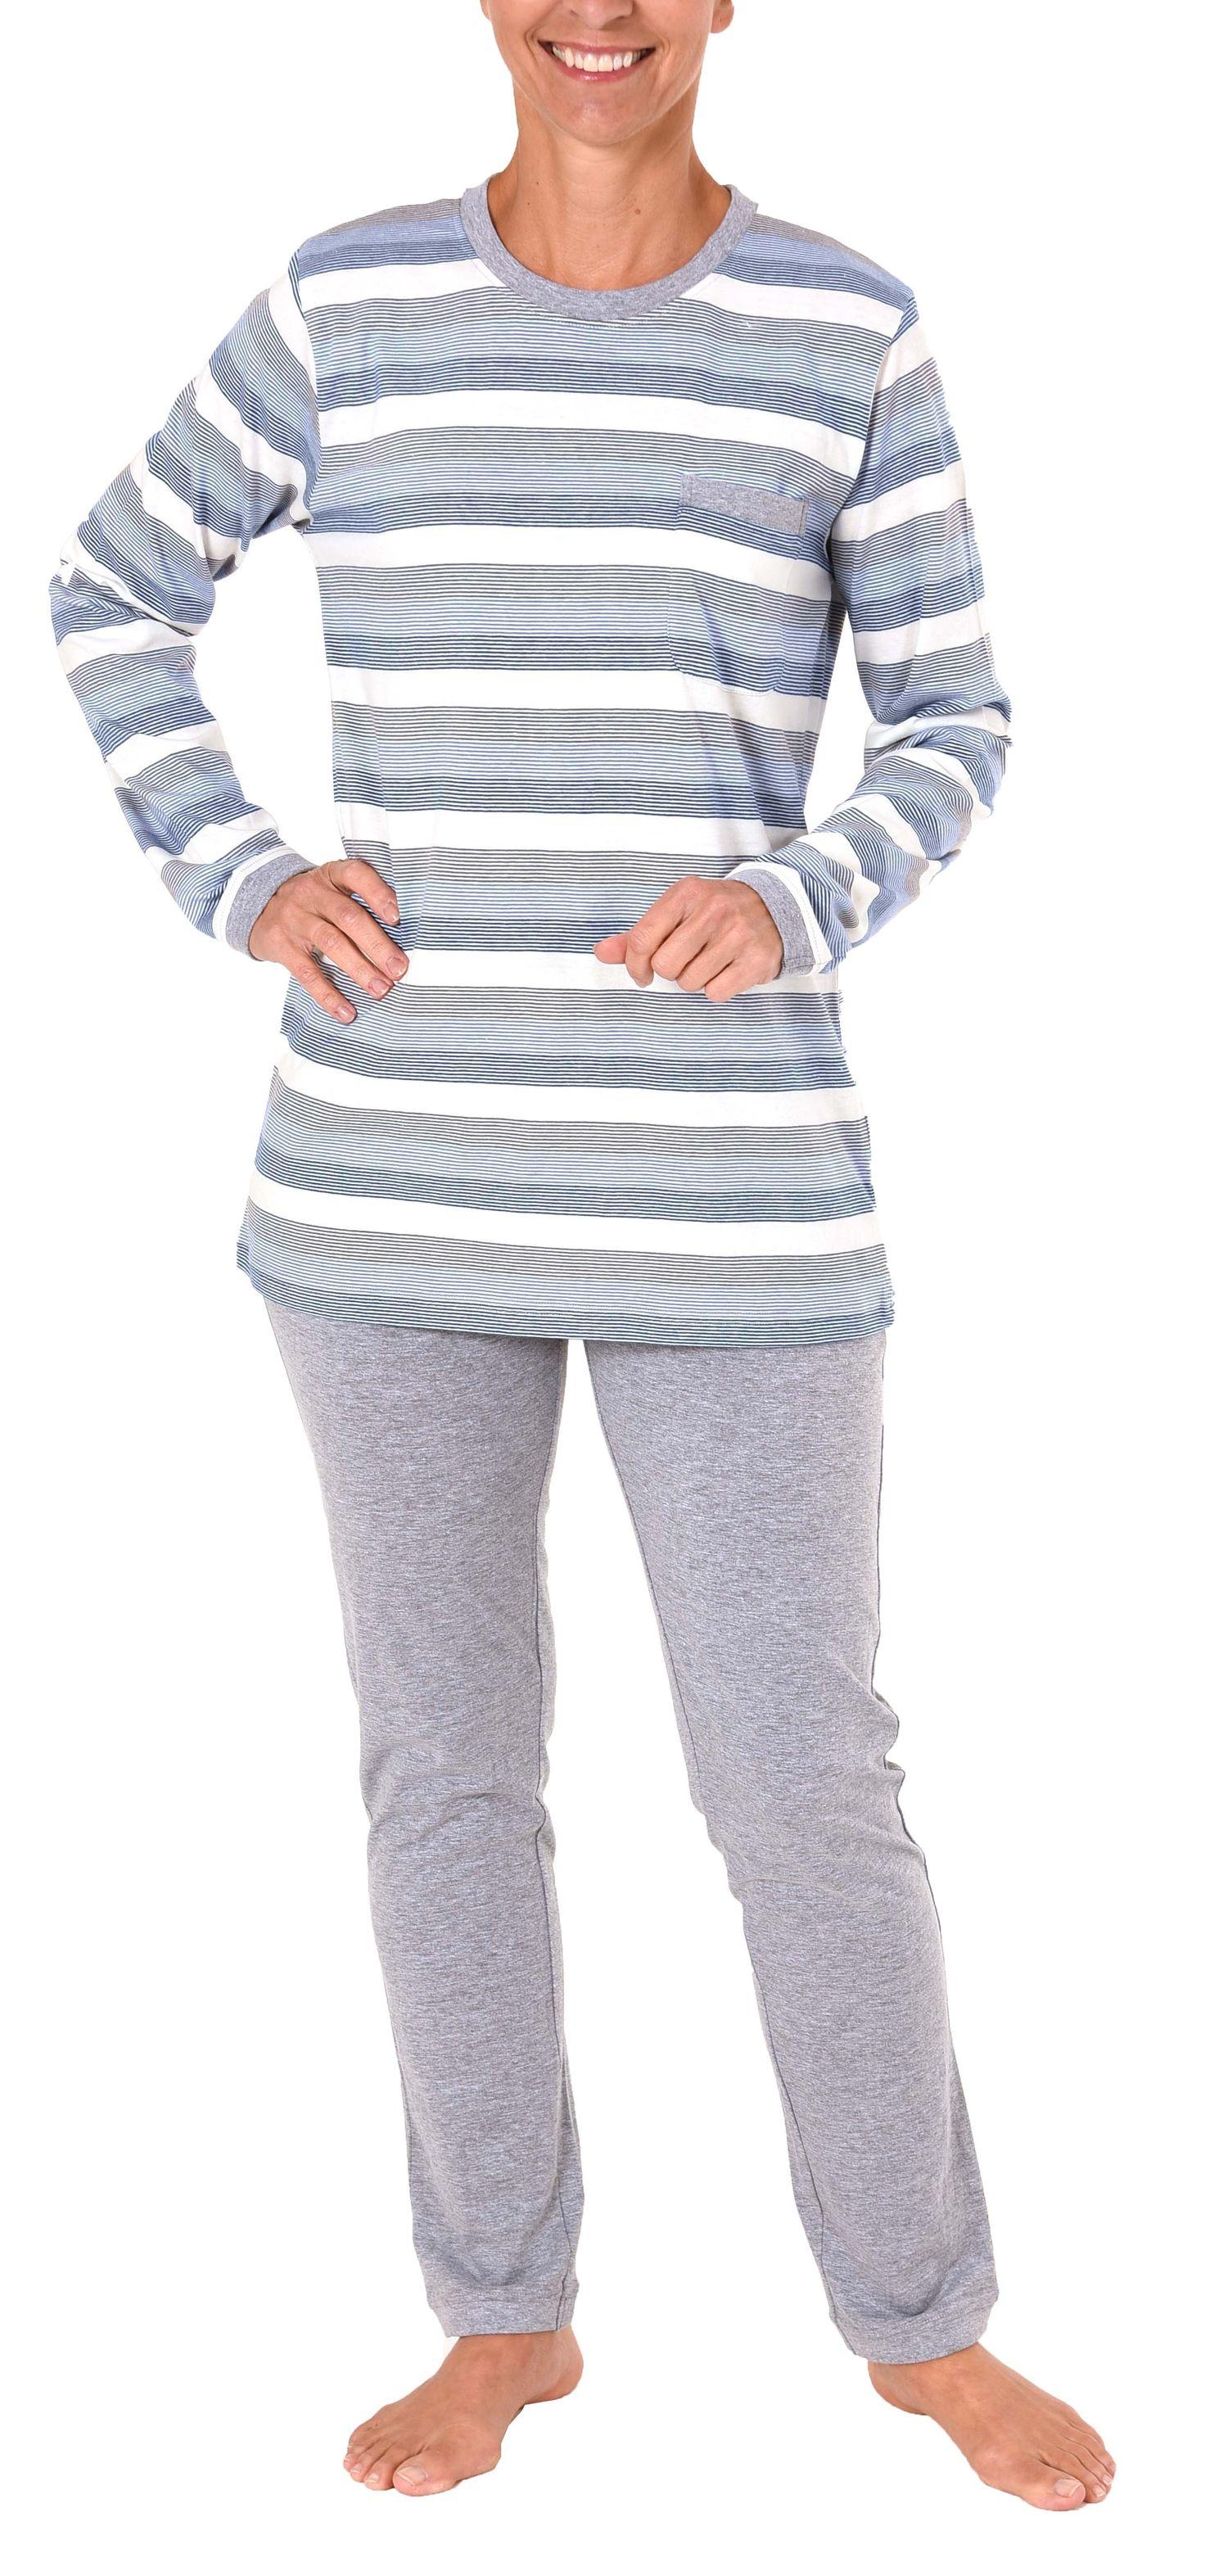 Toller Damen Pyjama langarm - auch in Übergrössen - wunderschöne Block Streifen Optik  – Bild 2